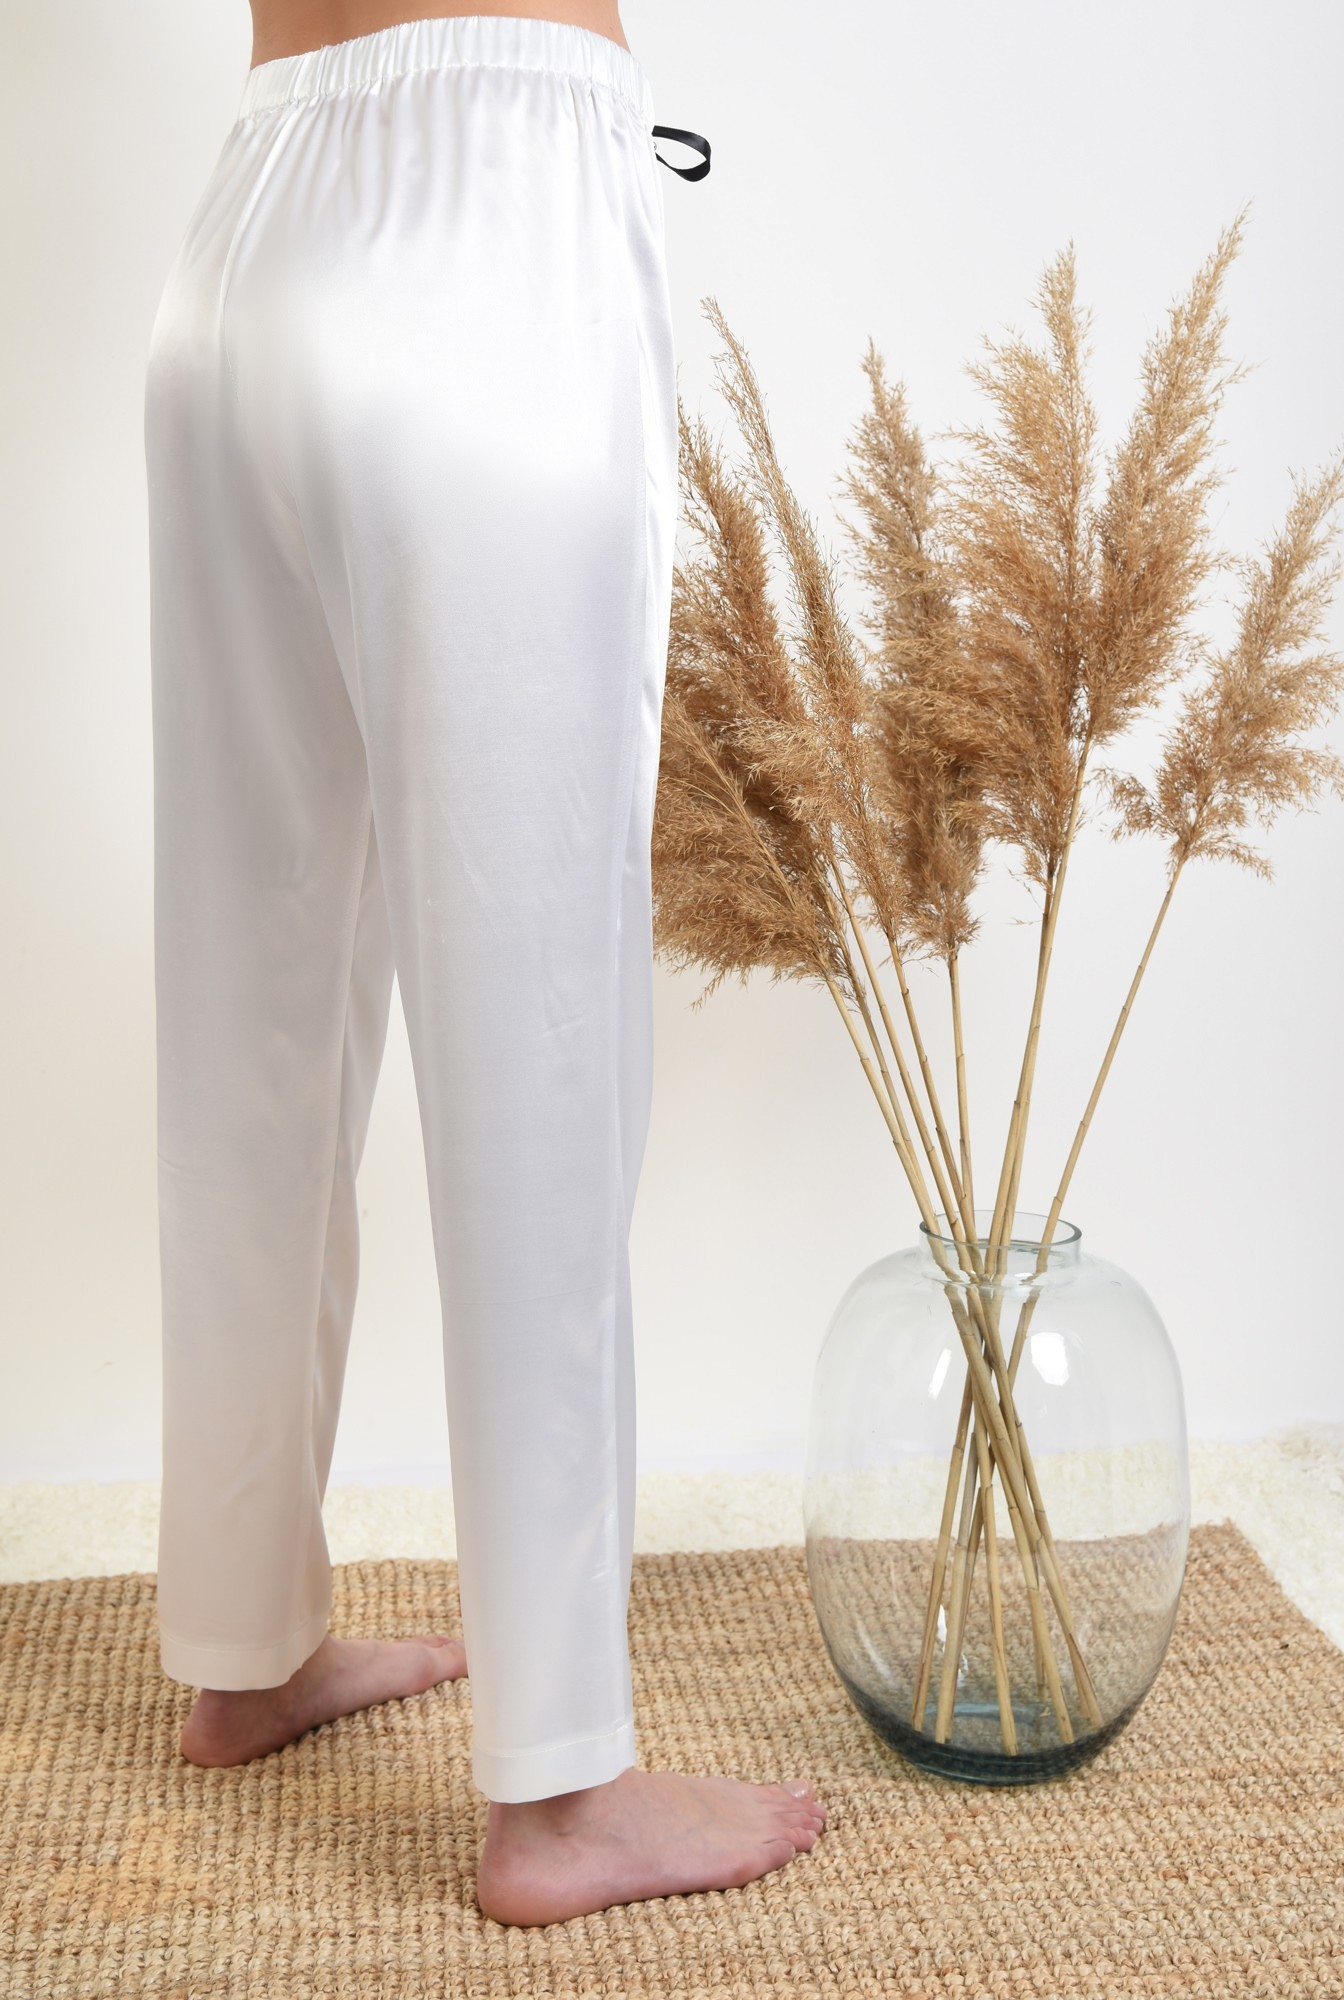 1 - pantaloni din satin, albi, lungi, cu funda in contrast